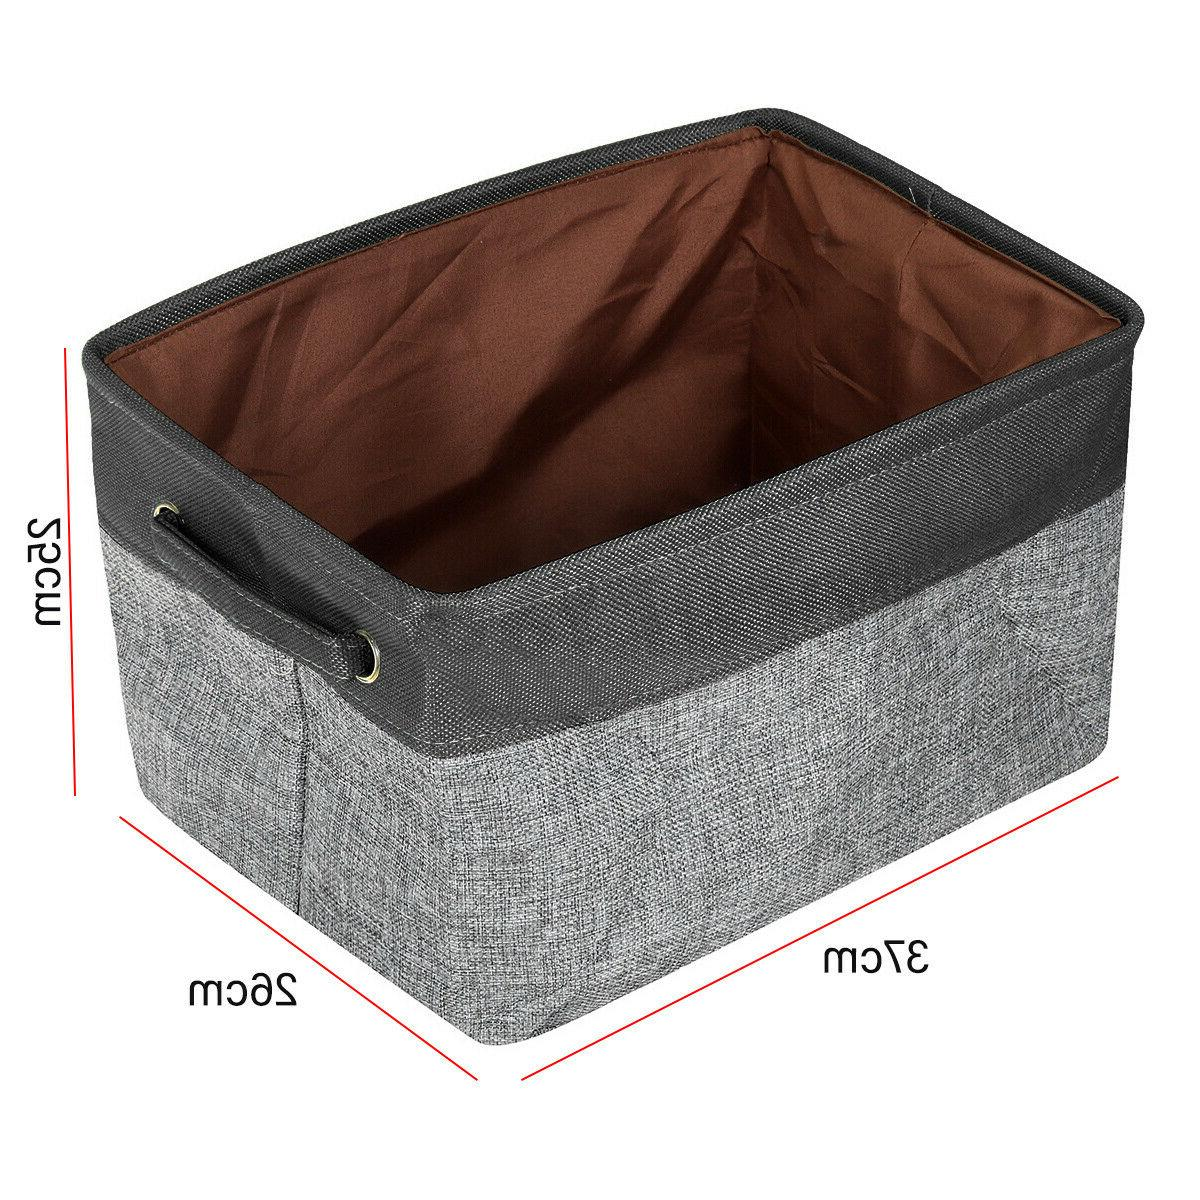 Foldable Washing Bag Organizer Gery